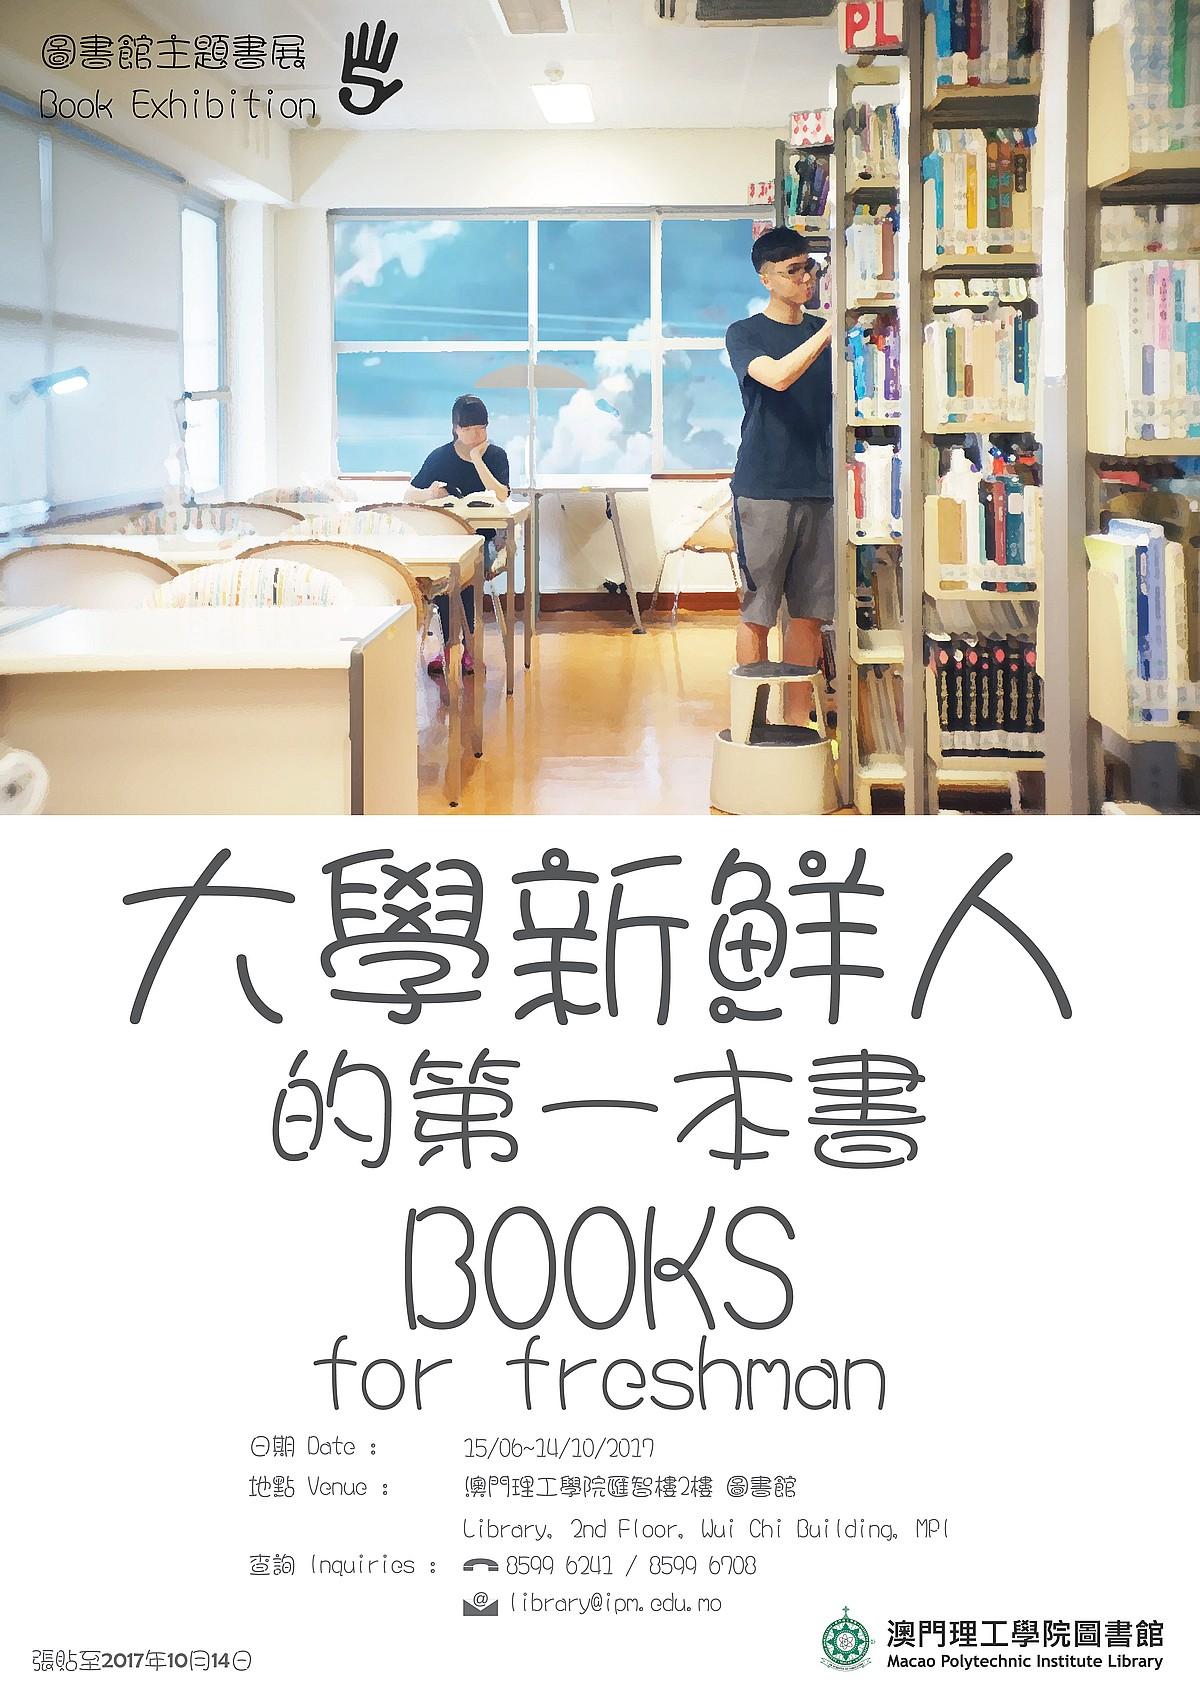 Books for Freshman